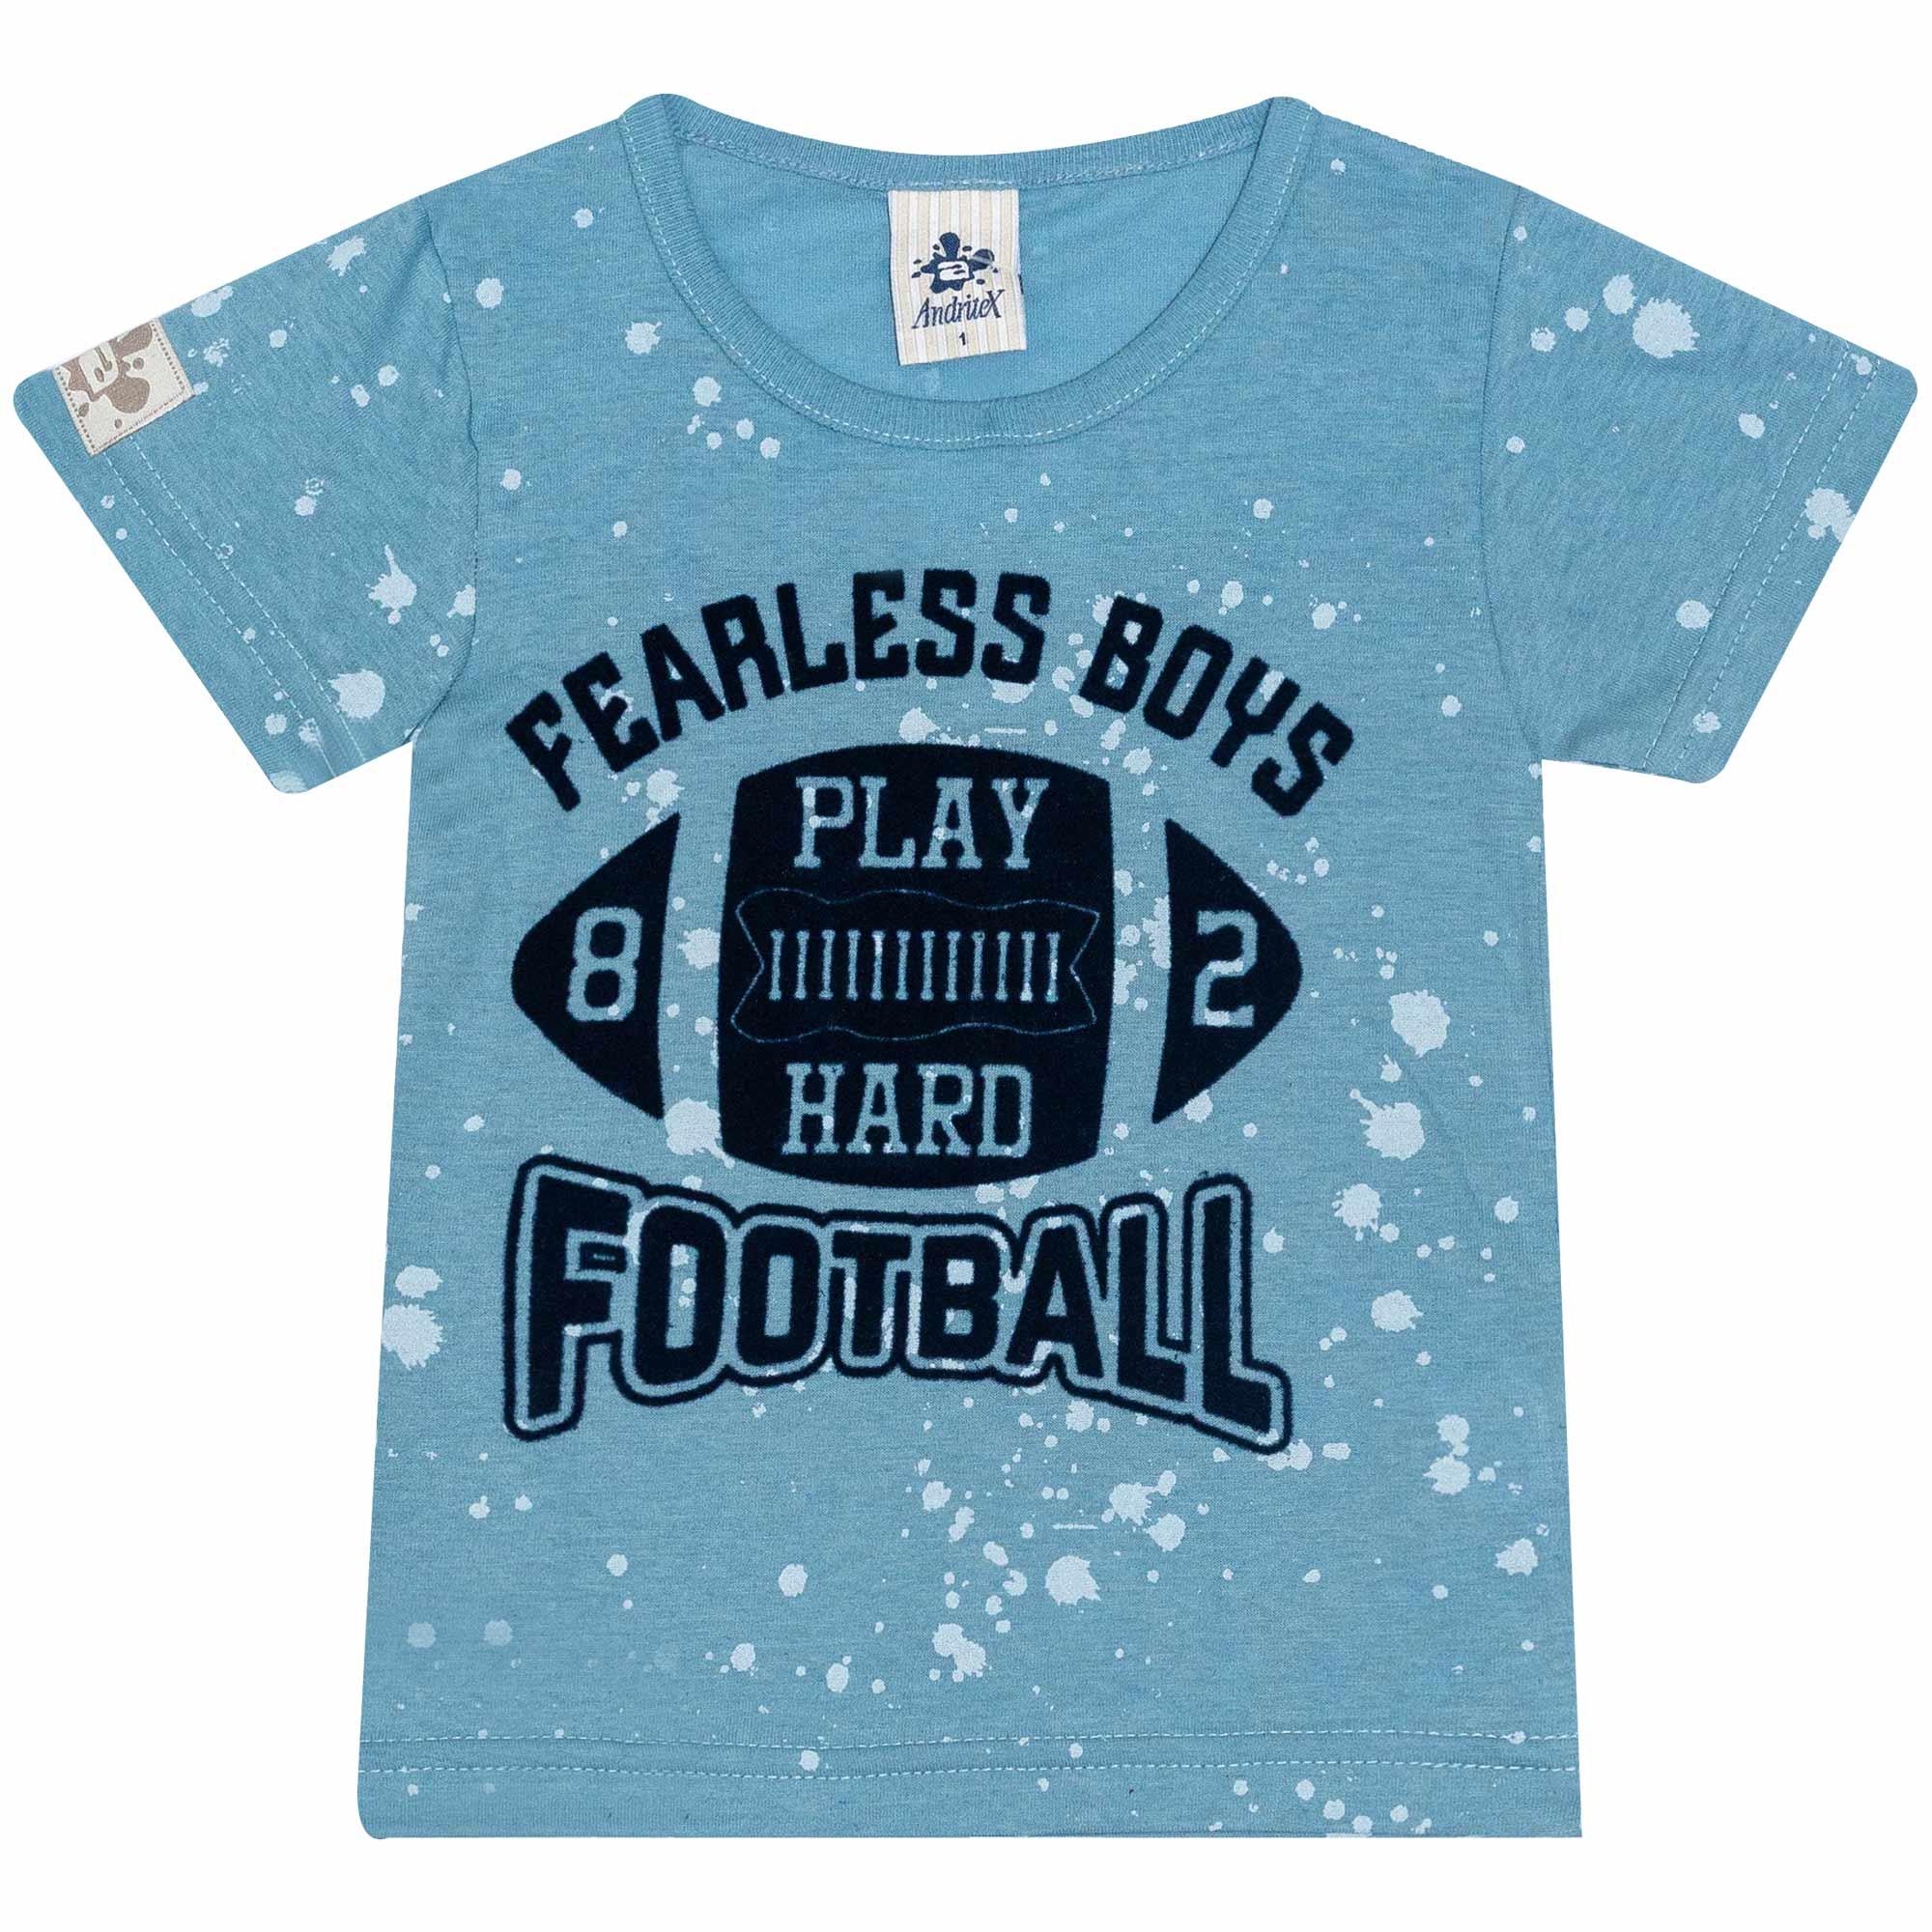 Camiseta Infantil Masculino - Ref 4740  - Azul - Andritex